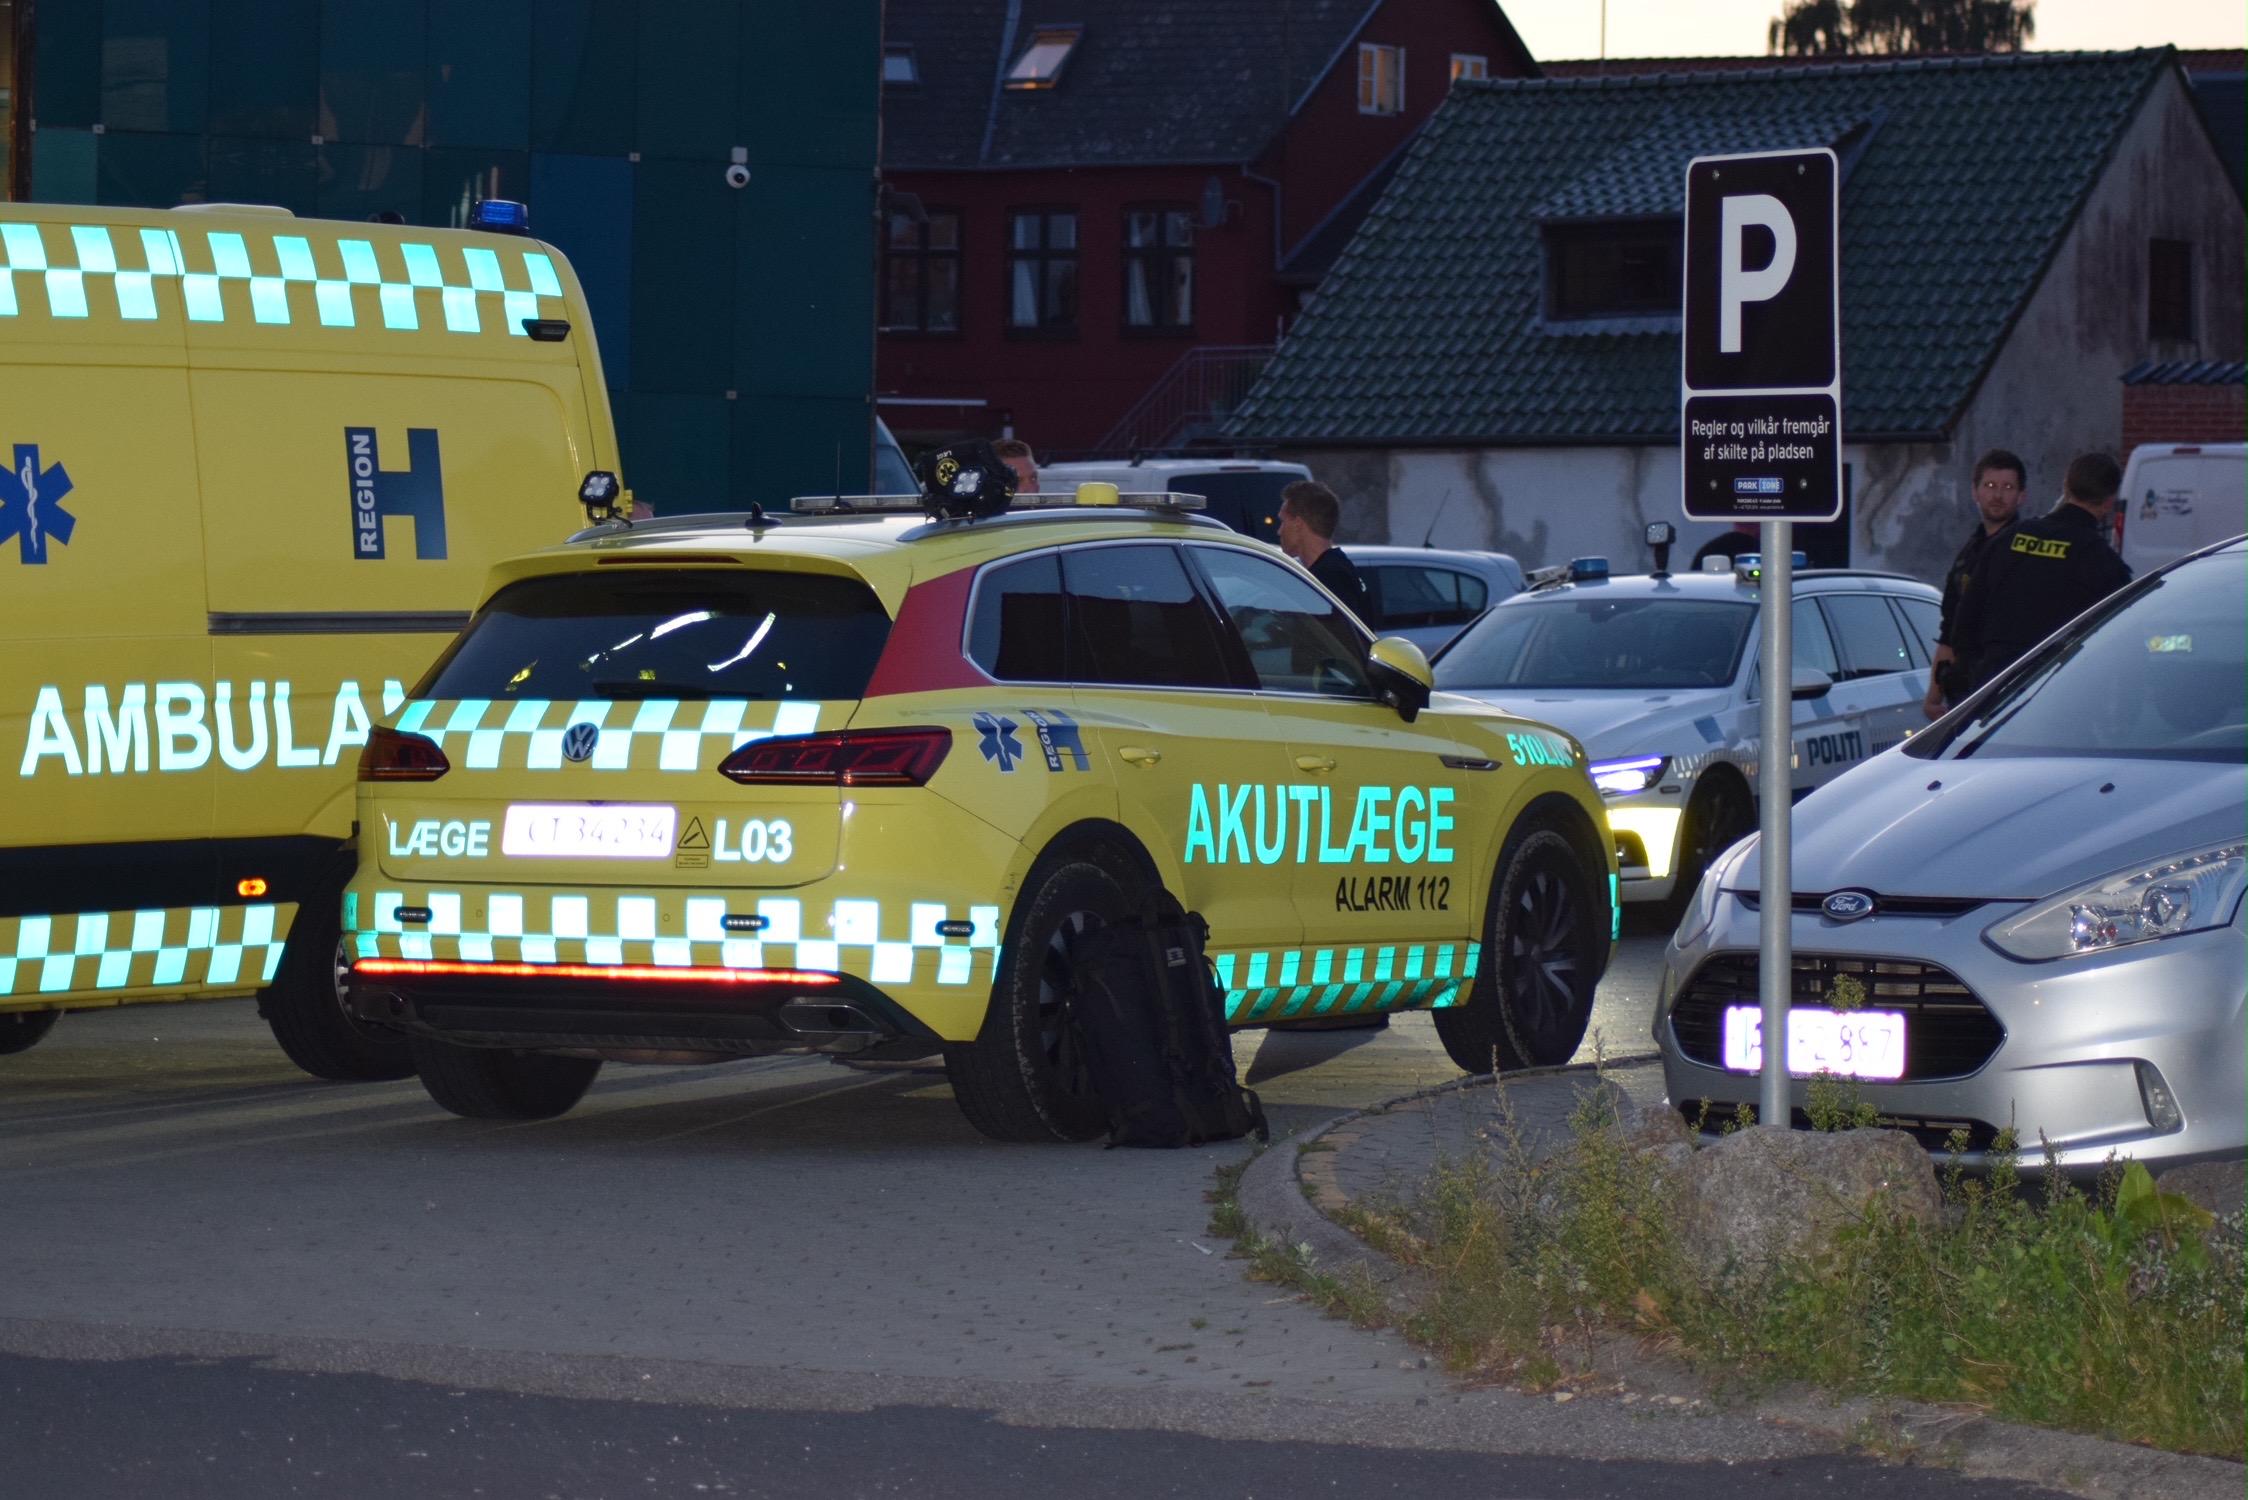 Stor politiaktion i Frederikssund